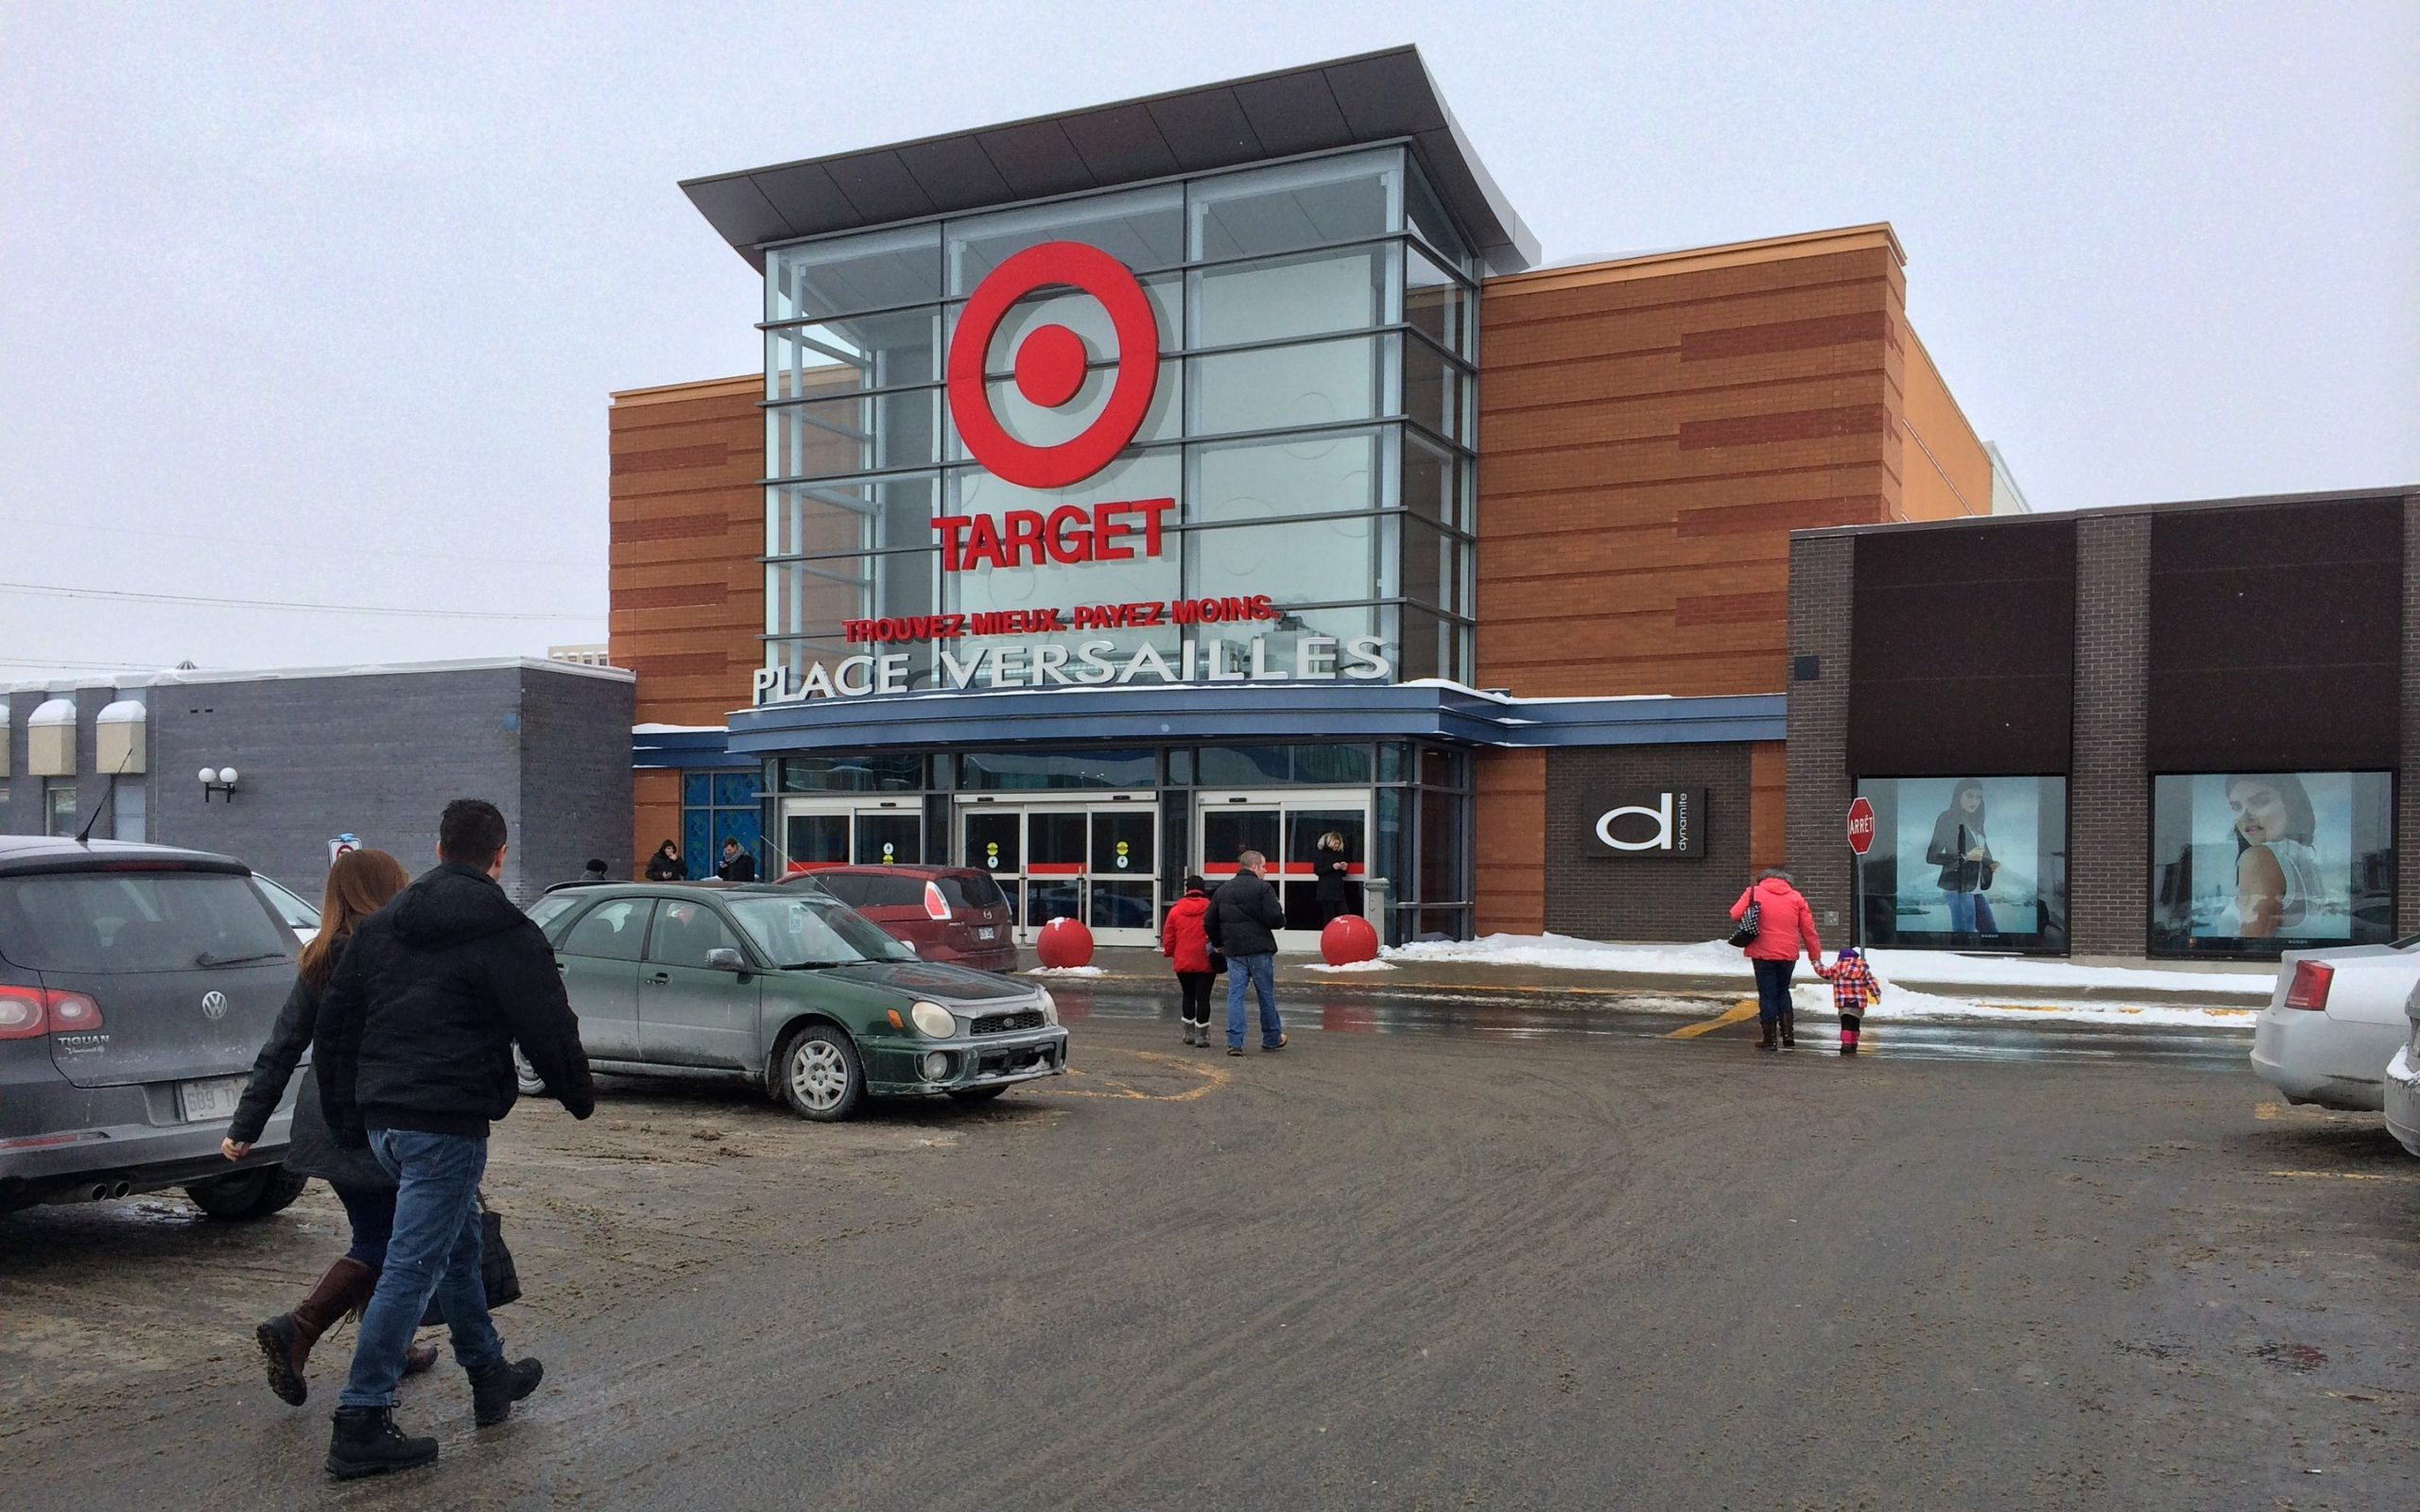 2880px-Target_Rue_Sherbrooke_Est_Montreal,_QC_1_(16553386417)